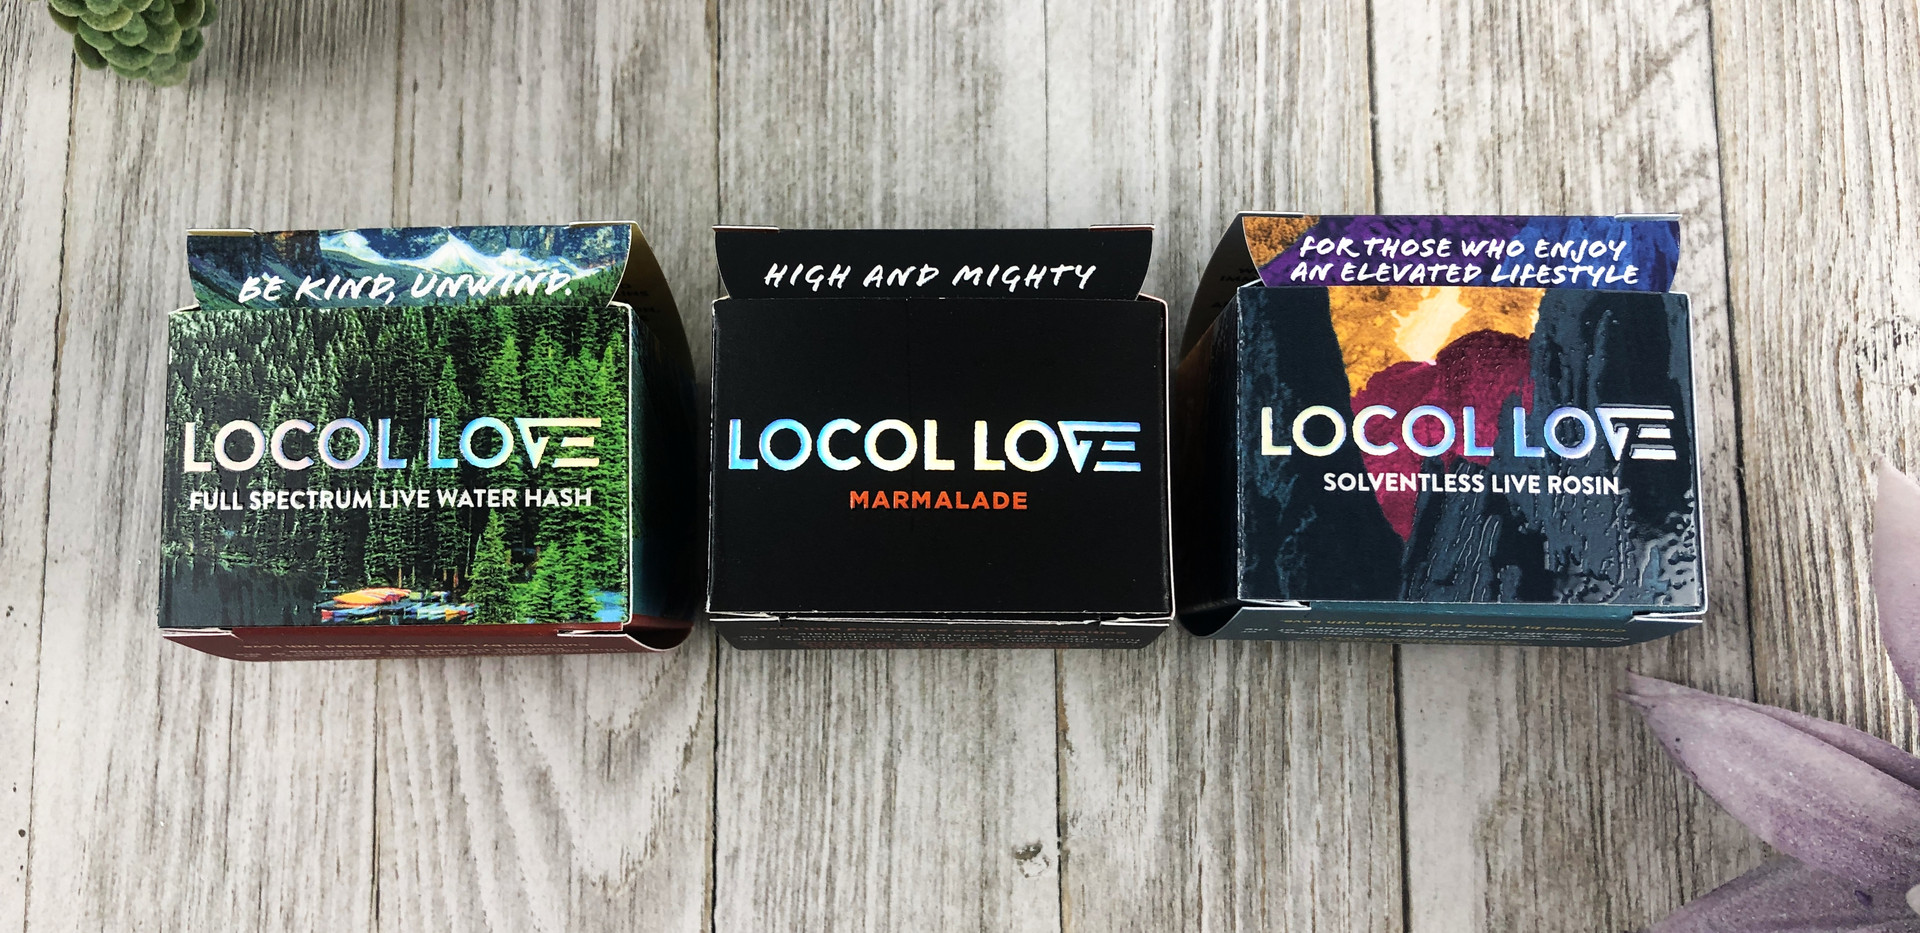 LoCol-Love-Concentrate-Box-Printing-2.jp